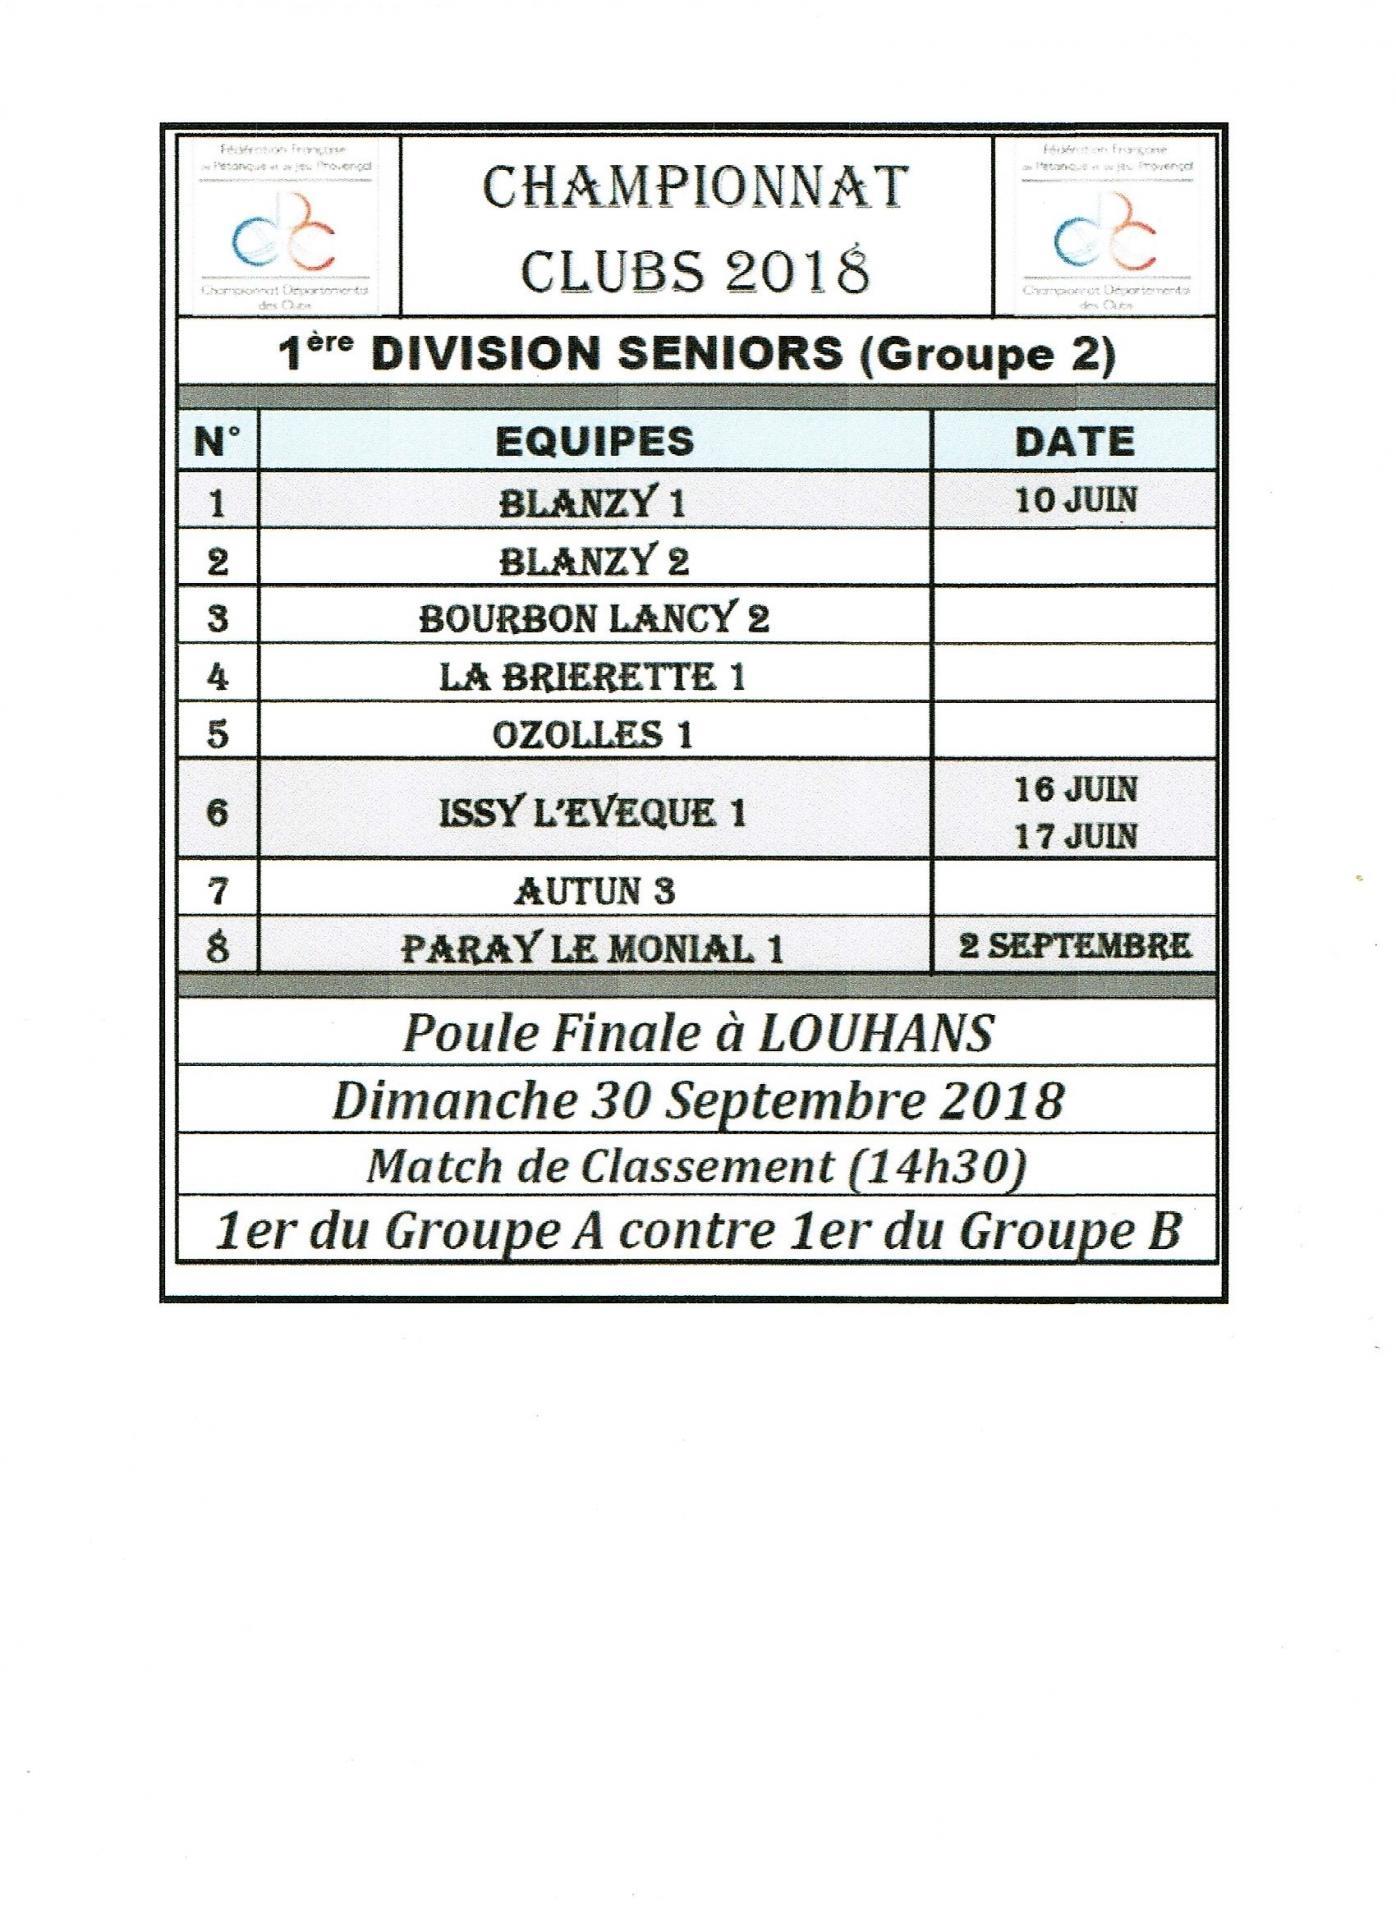 1ere division seniors g2